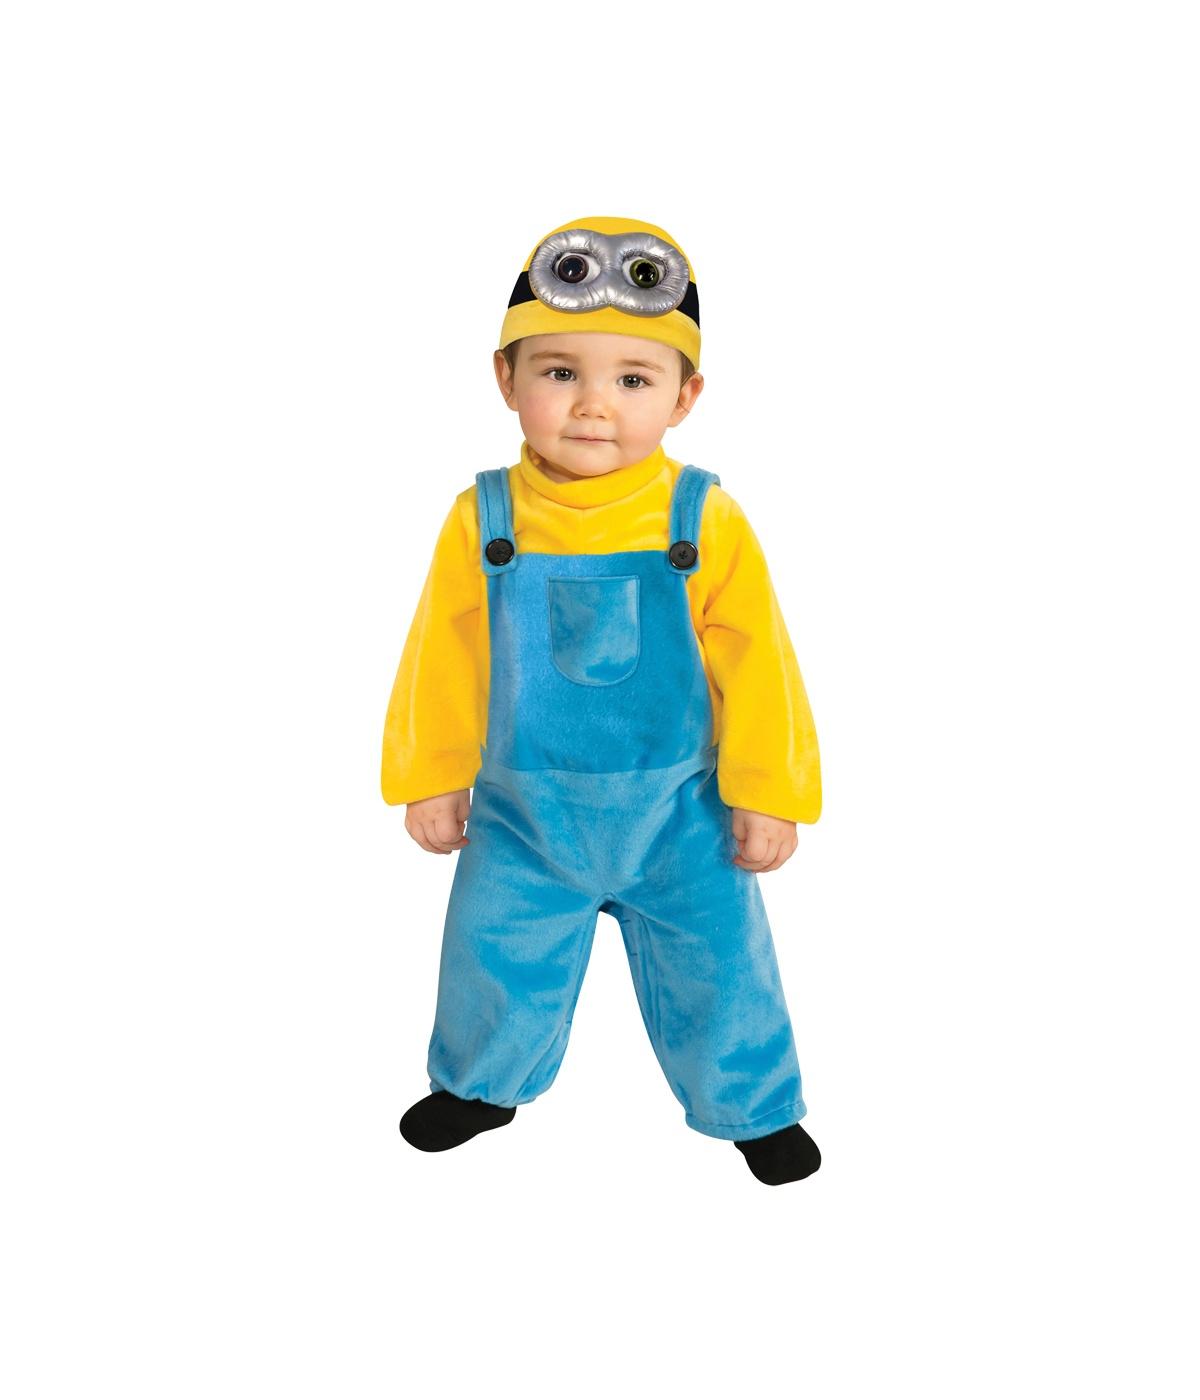 Despicably Cute Minion Bob Toddler Boys Costume - Movie Costumes